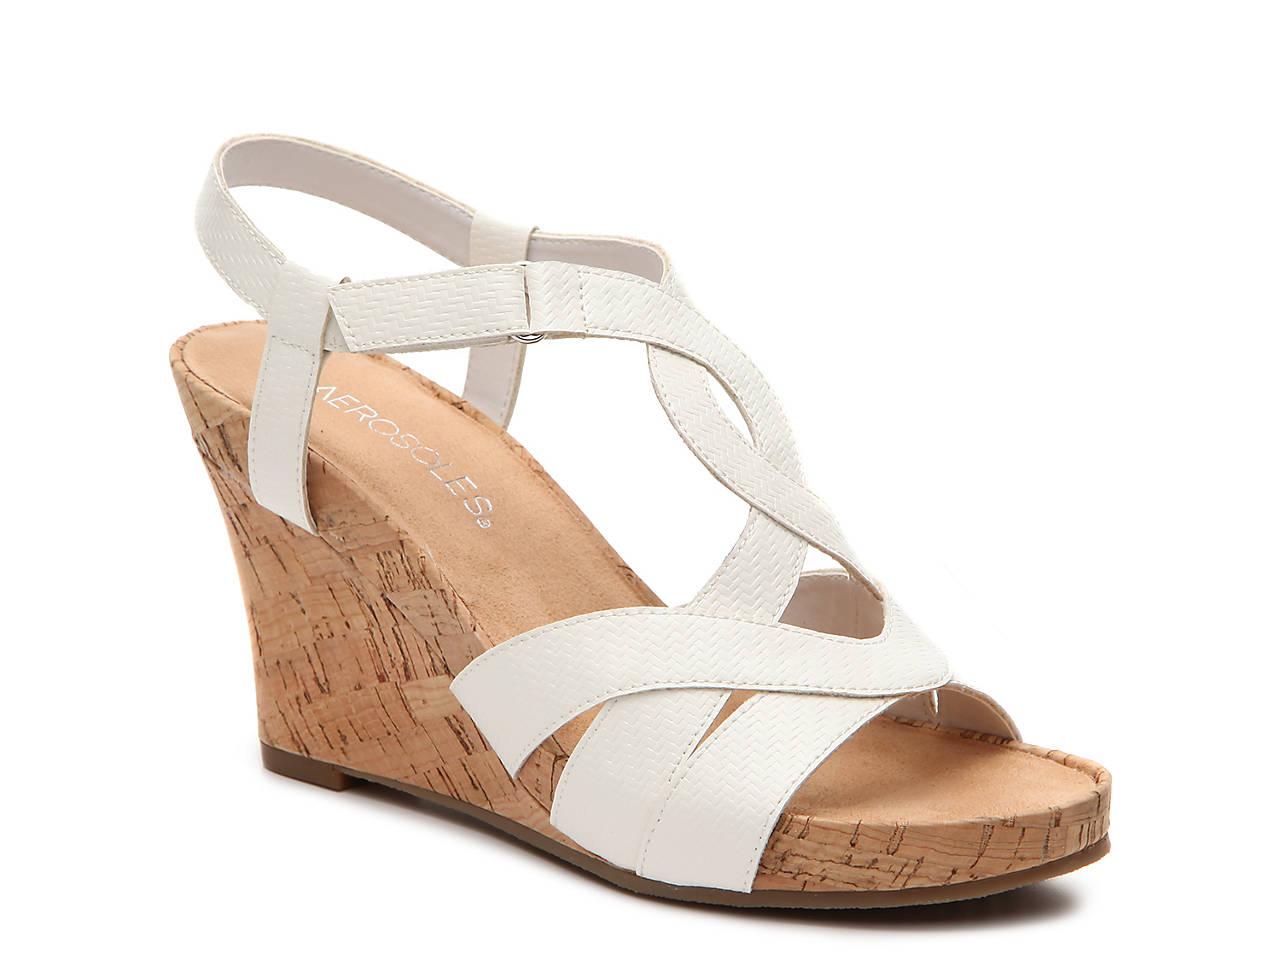 Womens Aerosoles Women's Cowrote Dress Sandal Retail Size 39